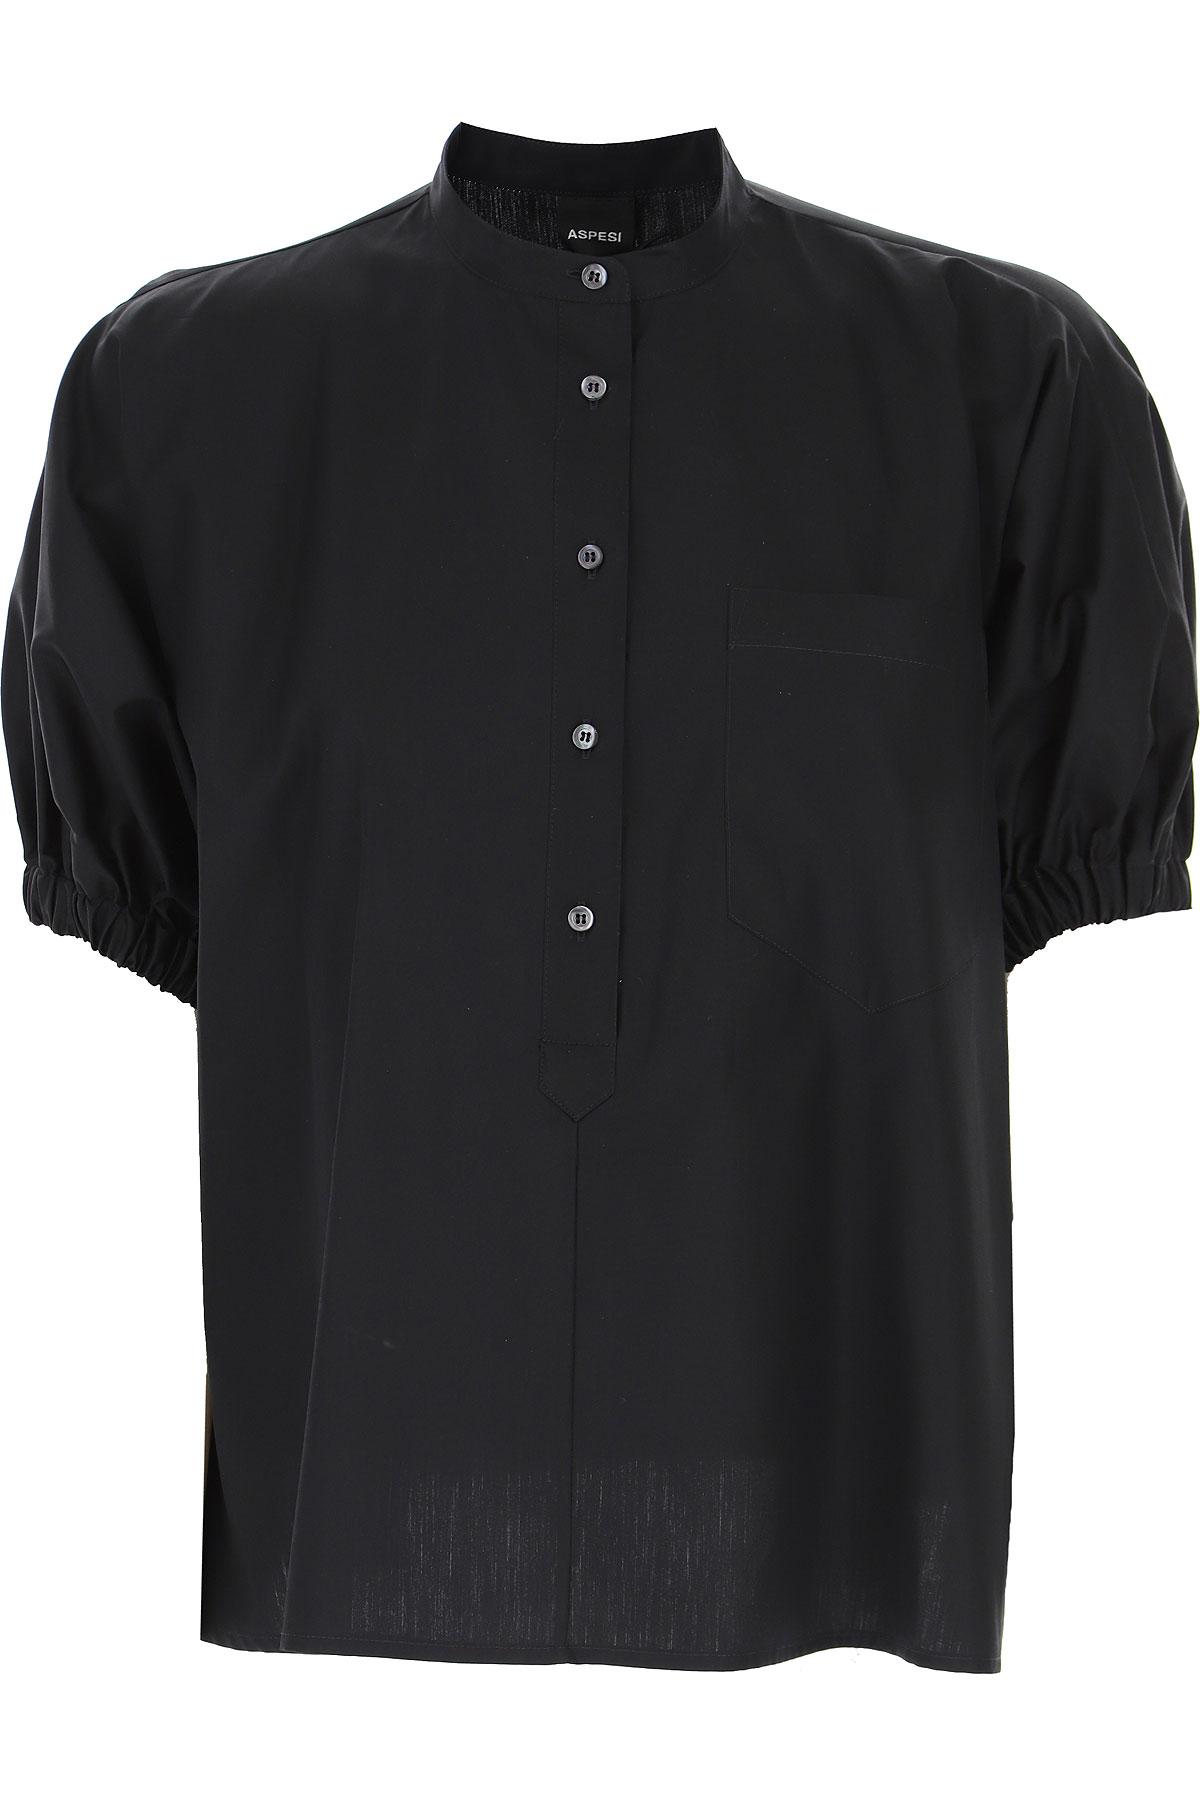 Aspesi Shirt for Women On Sale, Black, Cotton, 2019, S (IT 40) M (IT 42 )